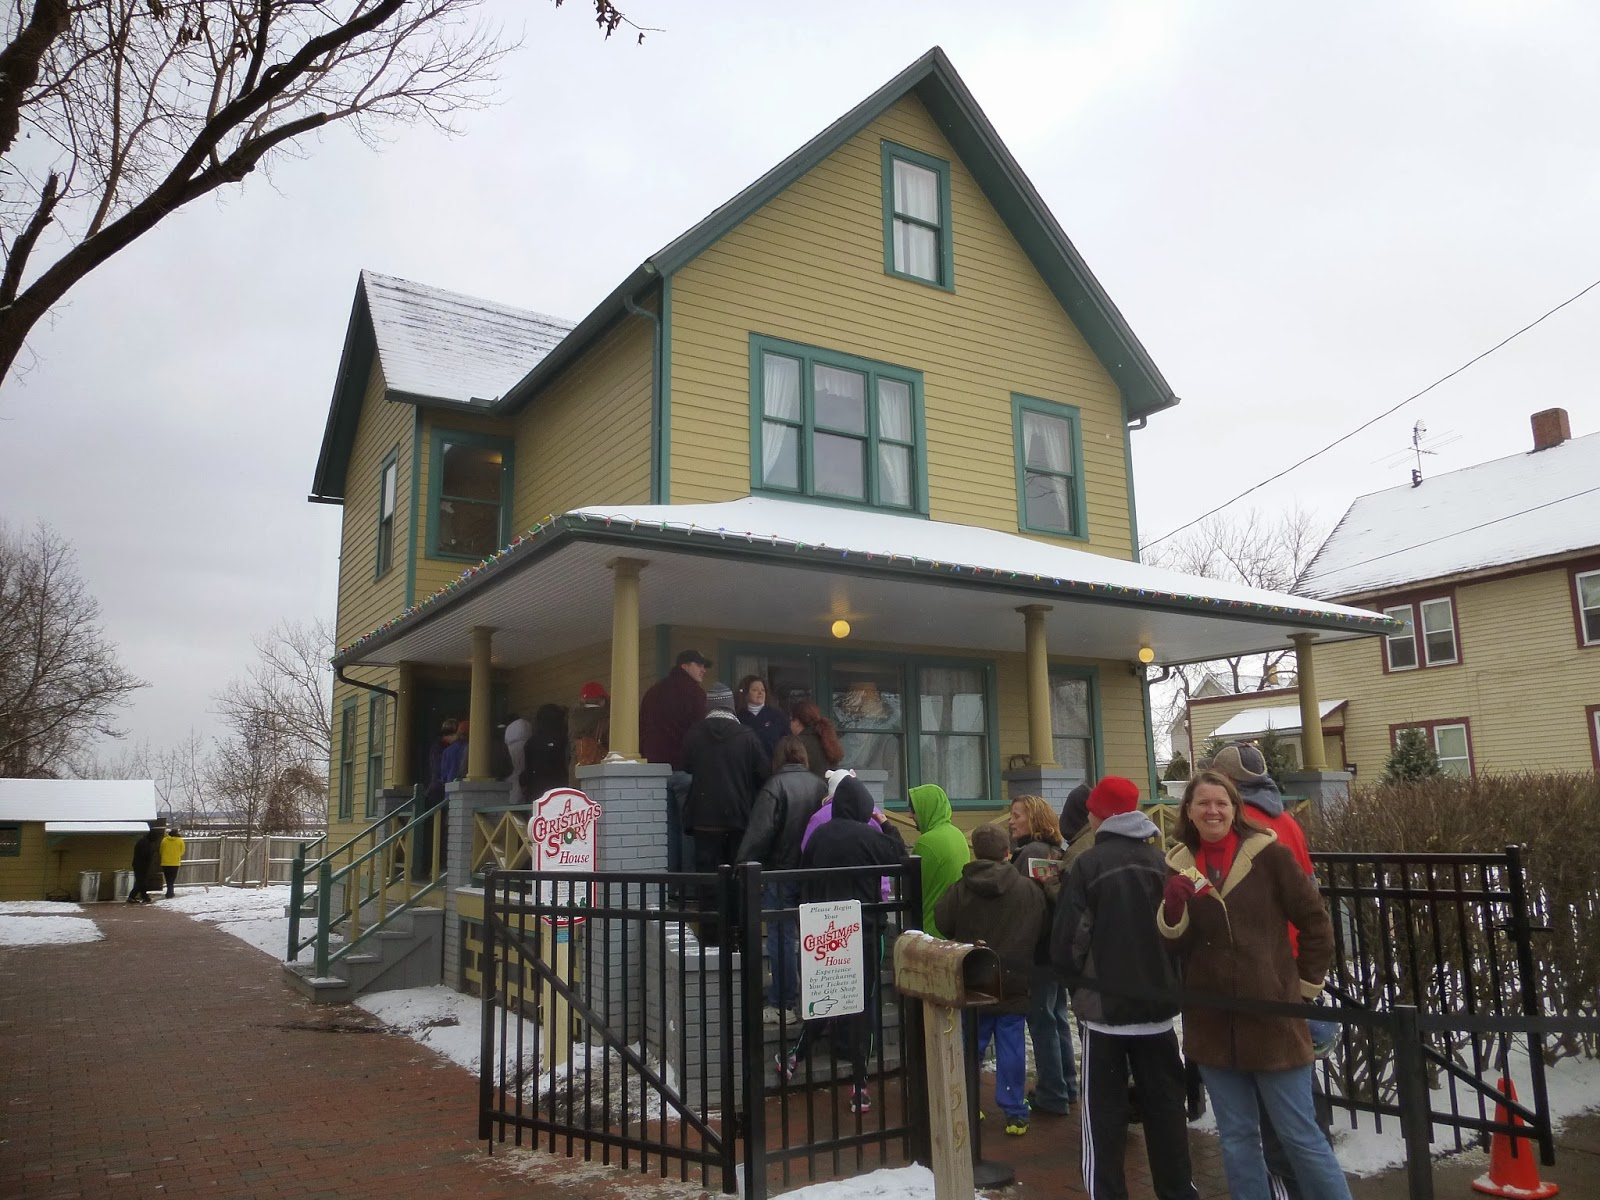 Christmas Story Location.Pillsbury Press Christmas Story House